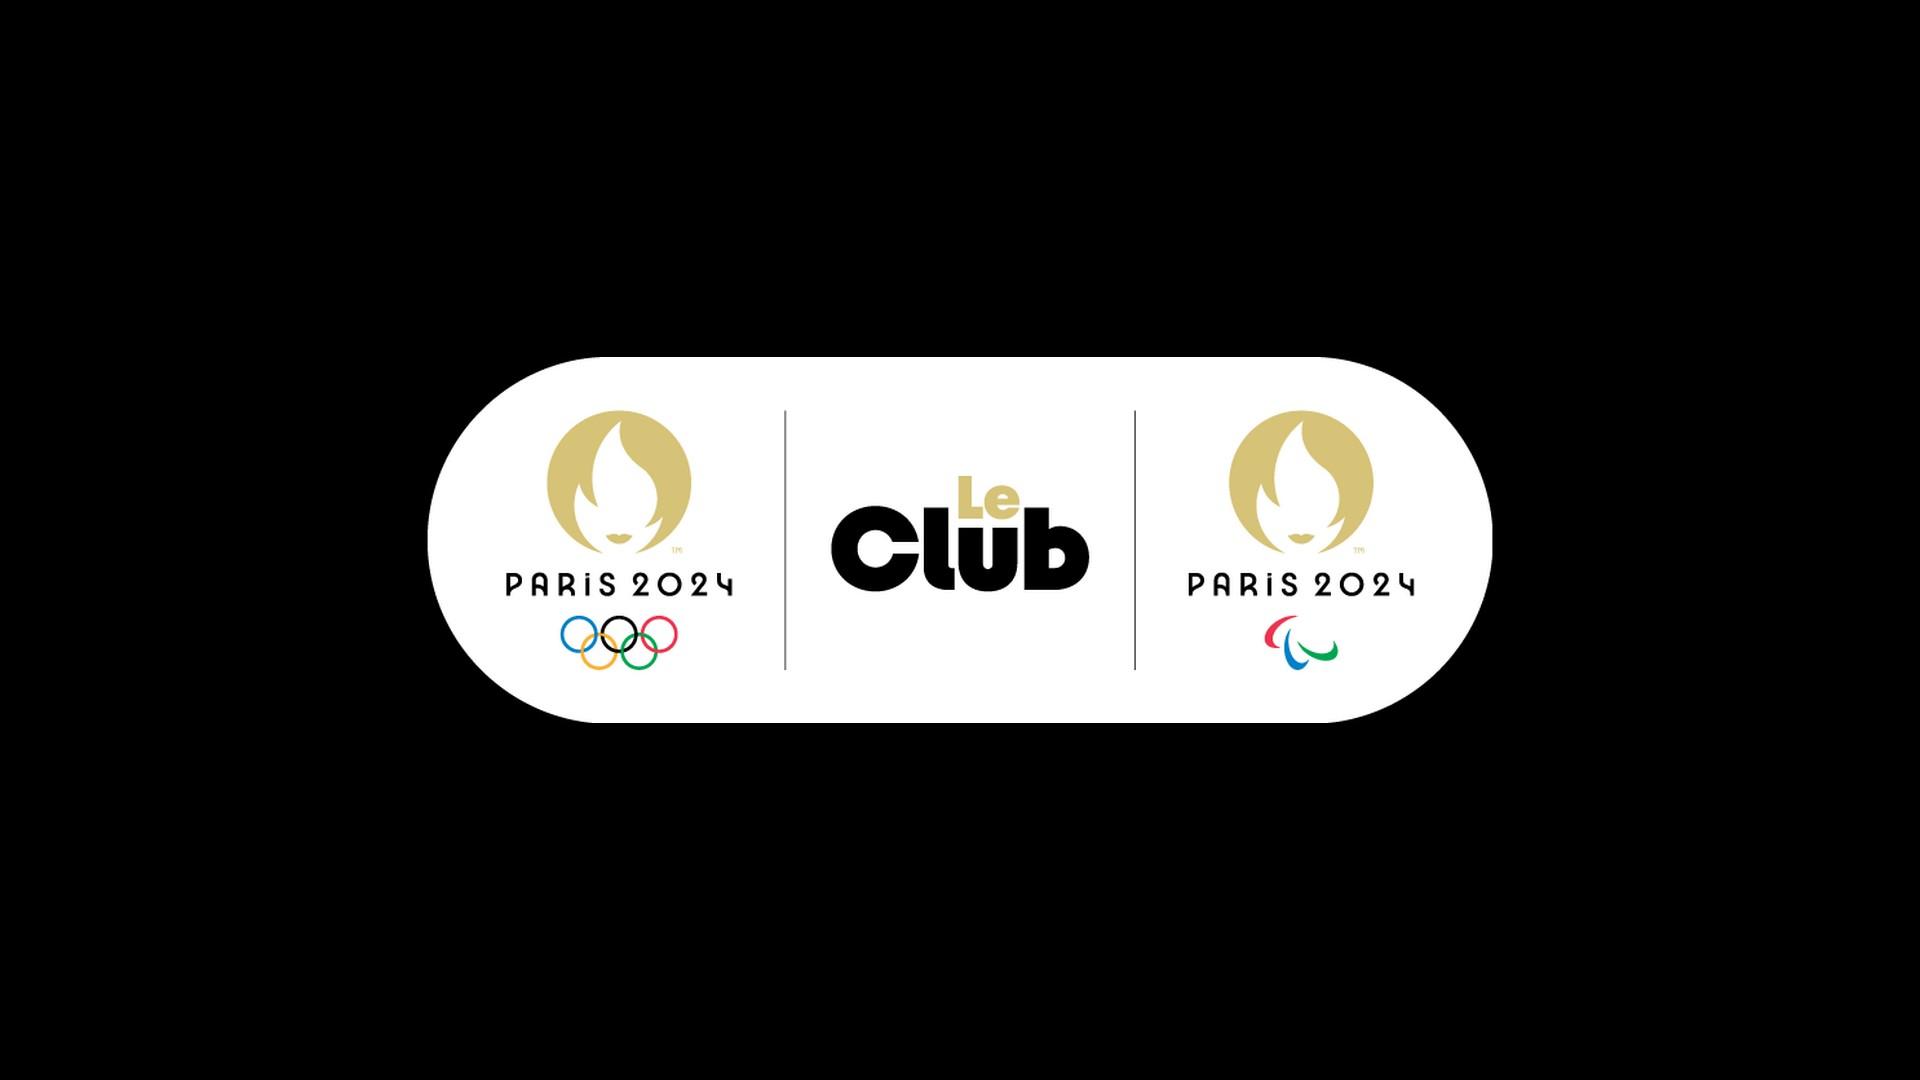 Club Paris 2024 (1) Logo